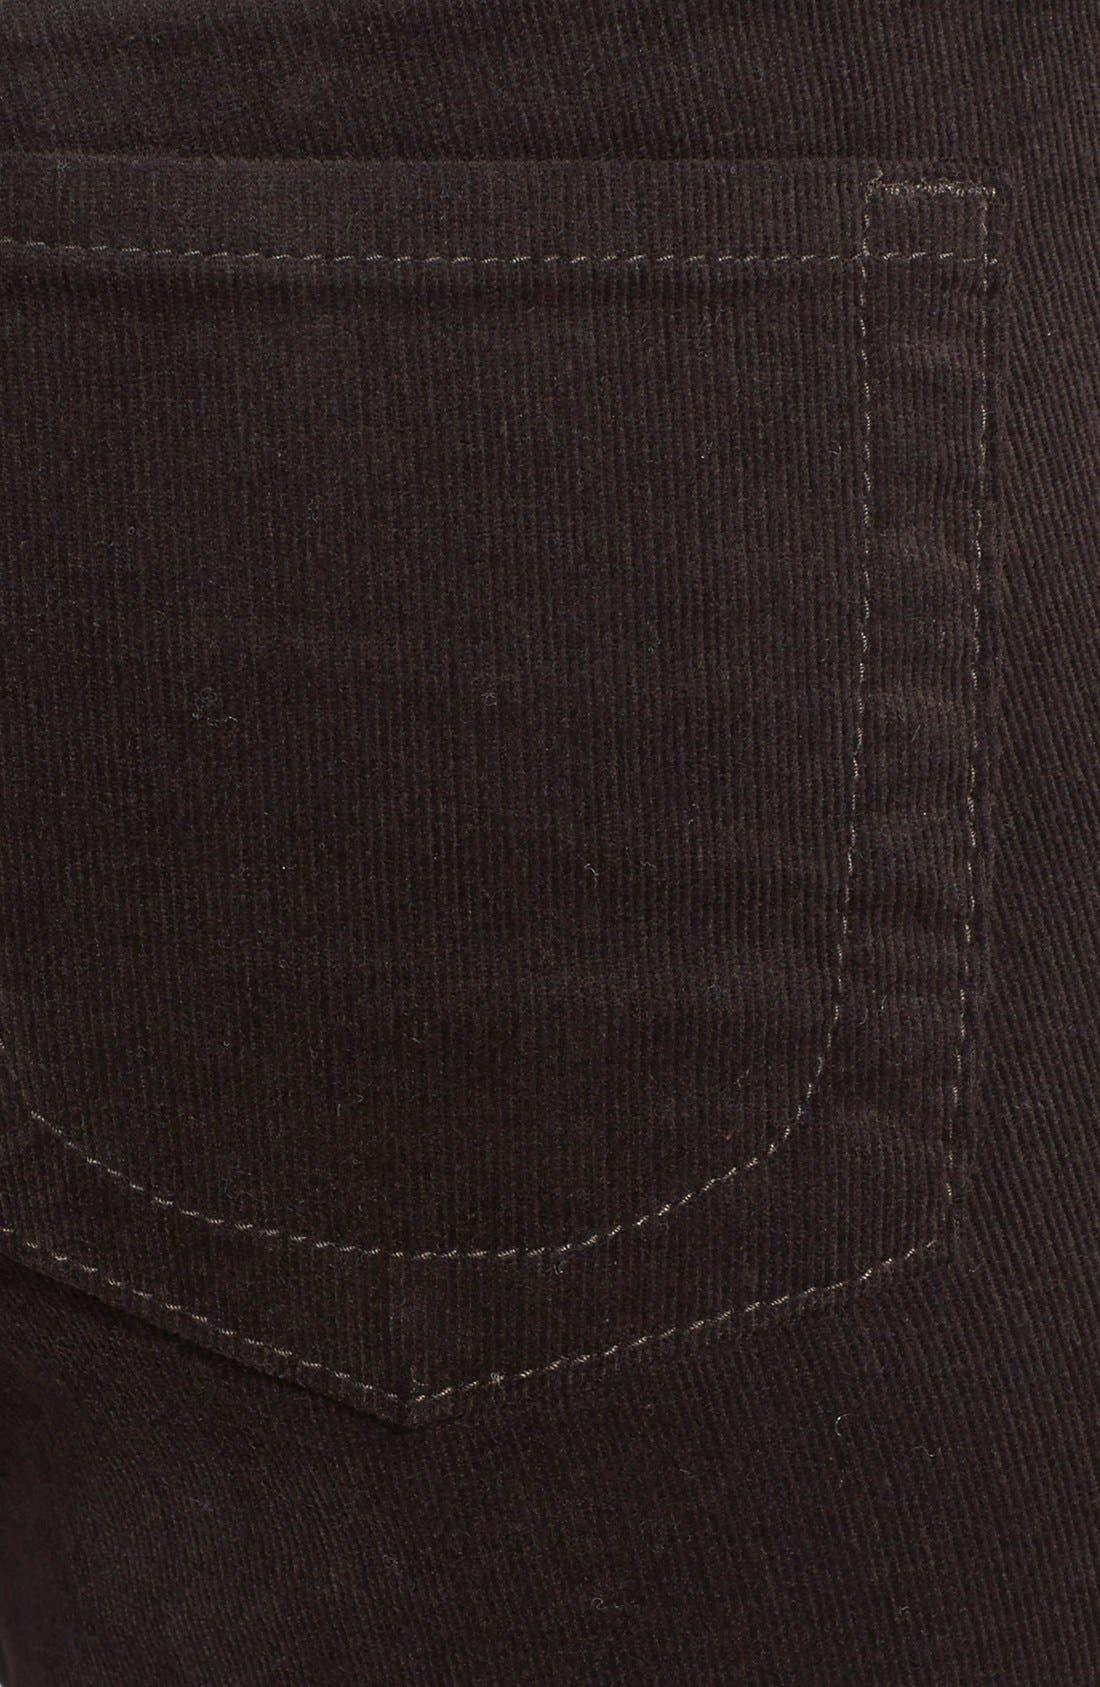 'Diana' Stretch Corduroy Skinny Pants,                             Alternate thumbnail 111, color,